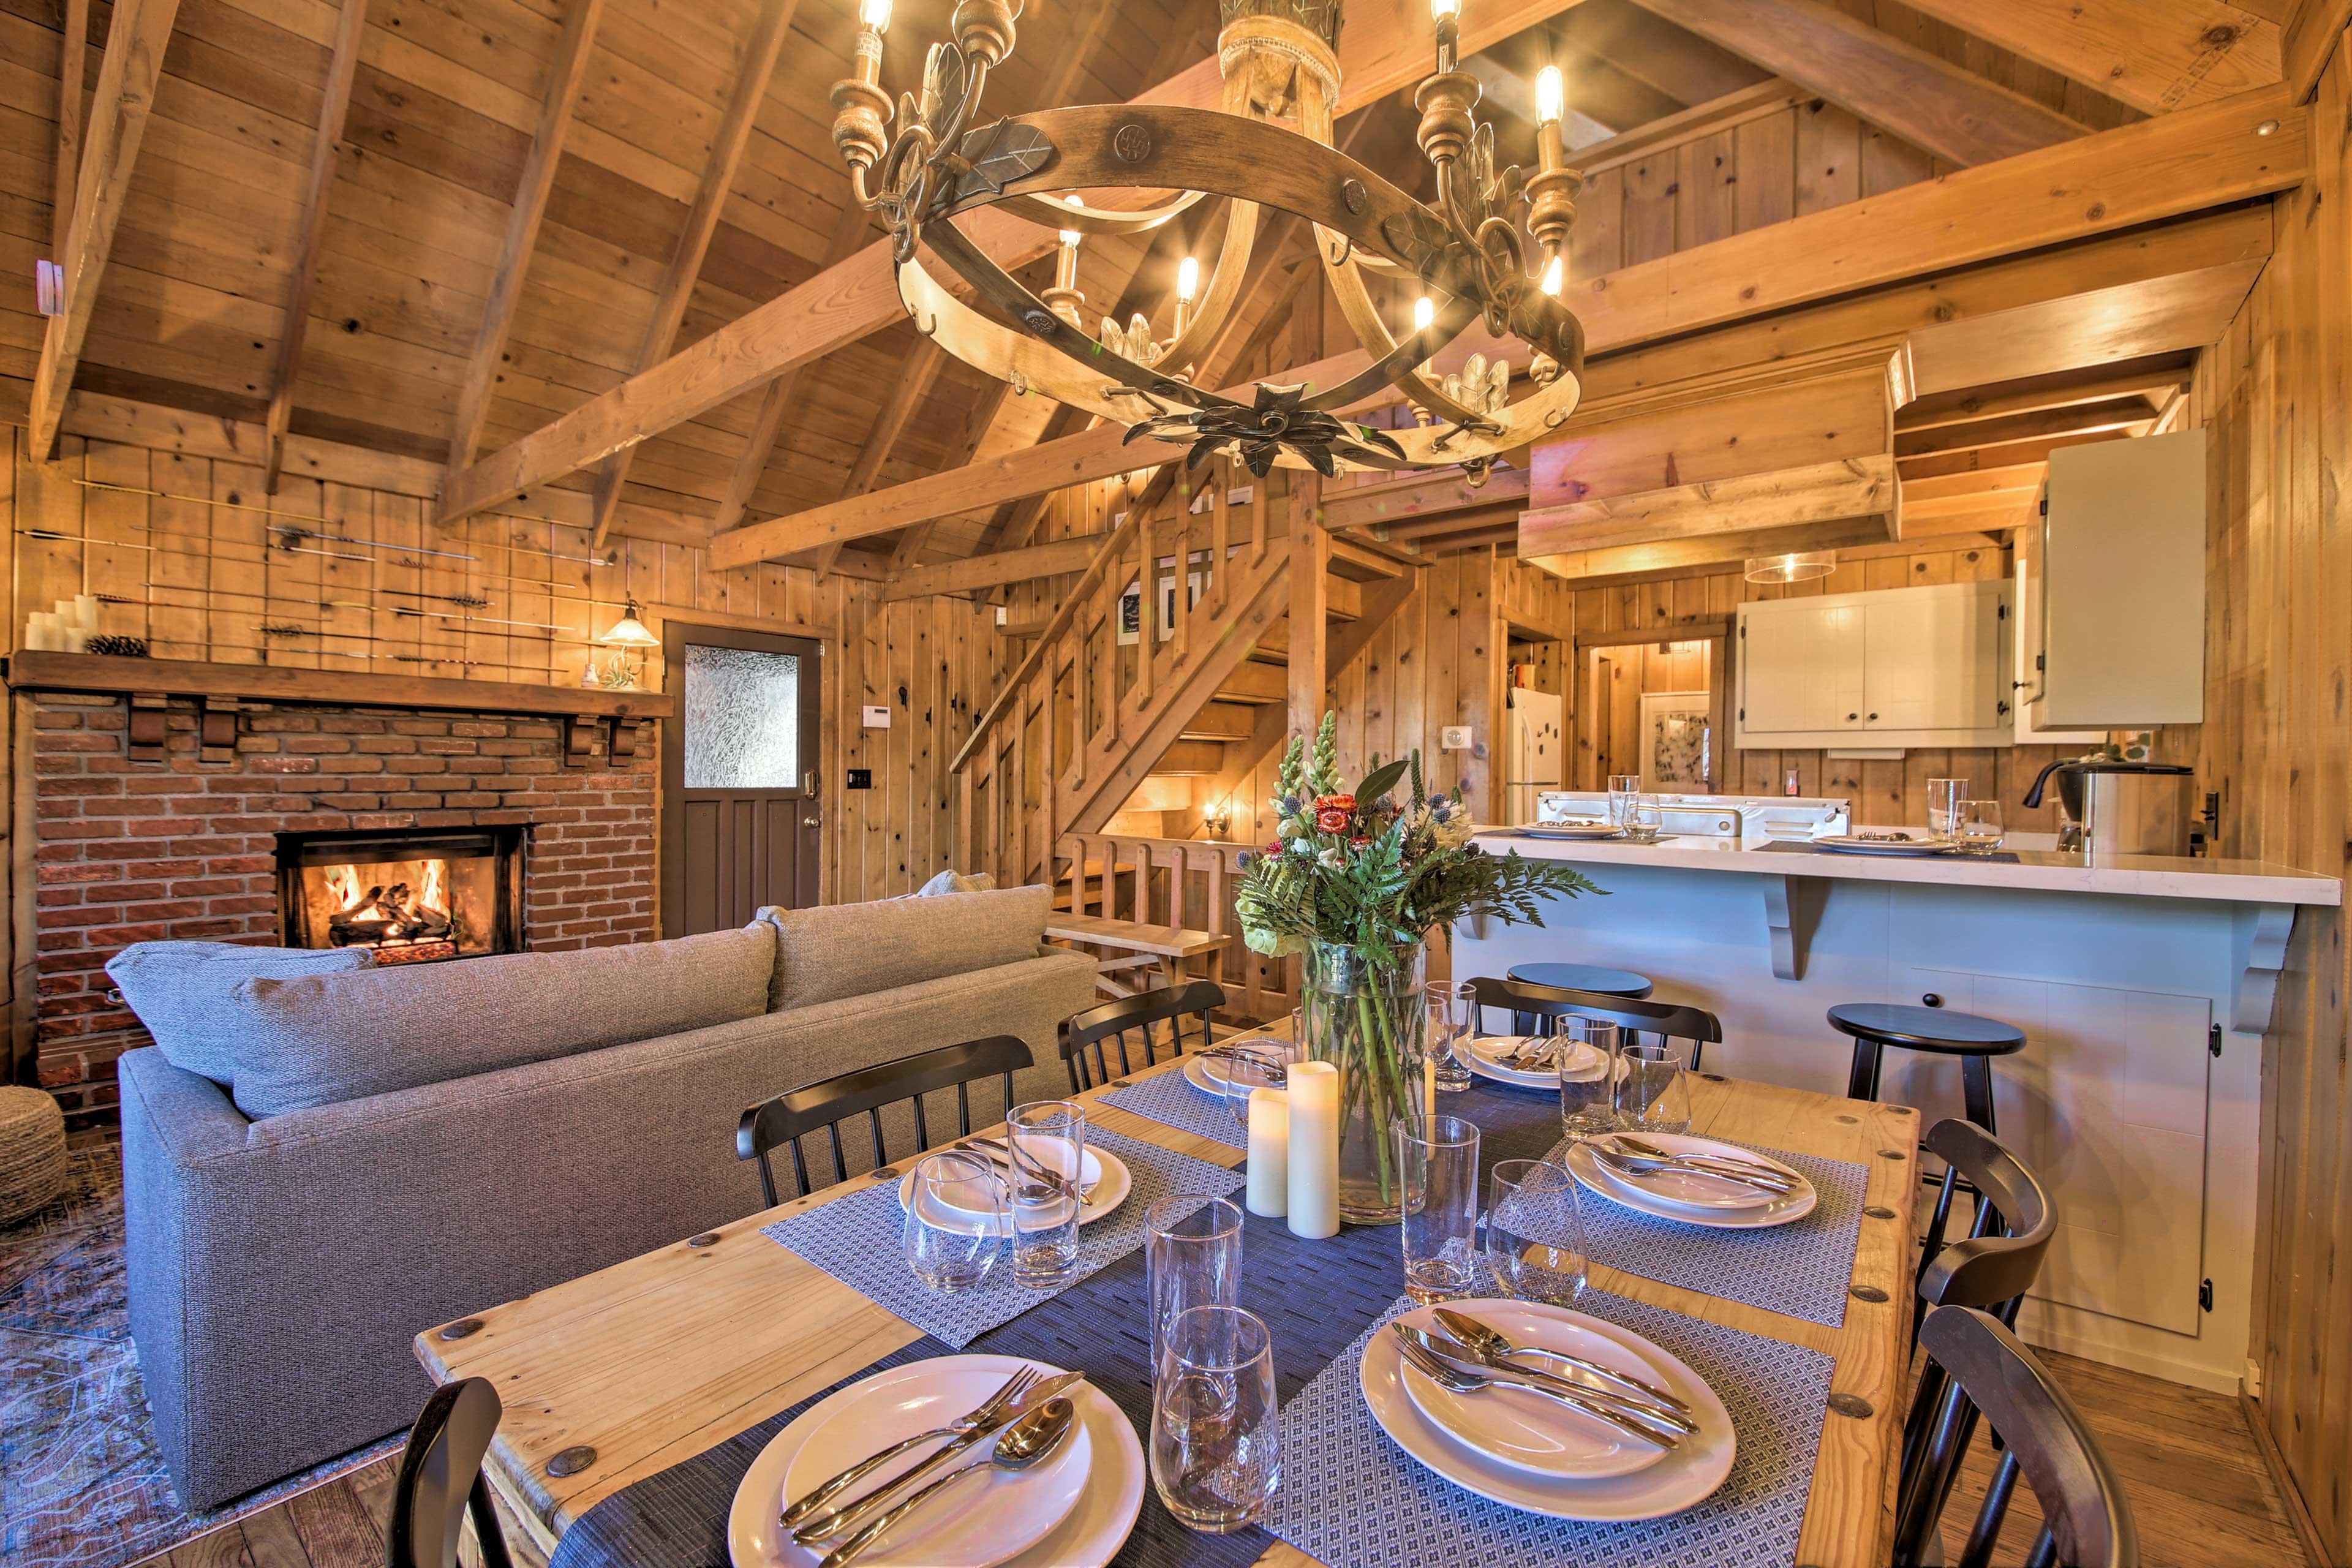 Your California getaway awaits at this stunning 3-BR, 2-BA vacation rental.